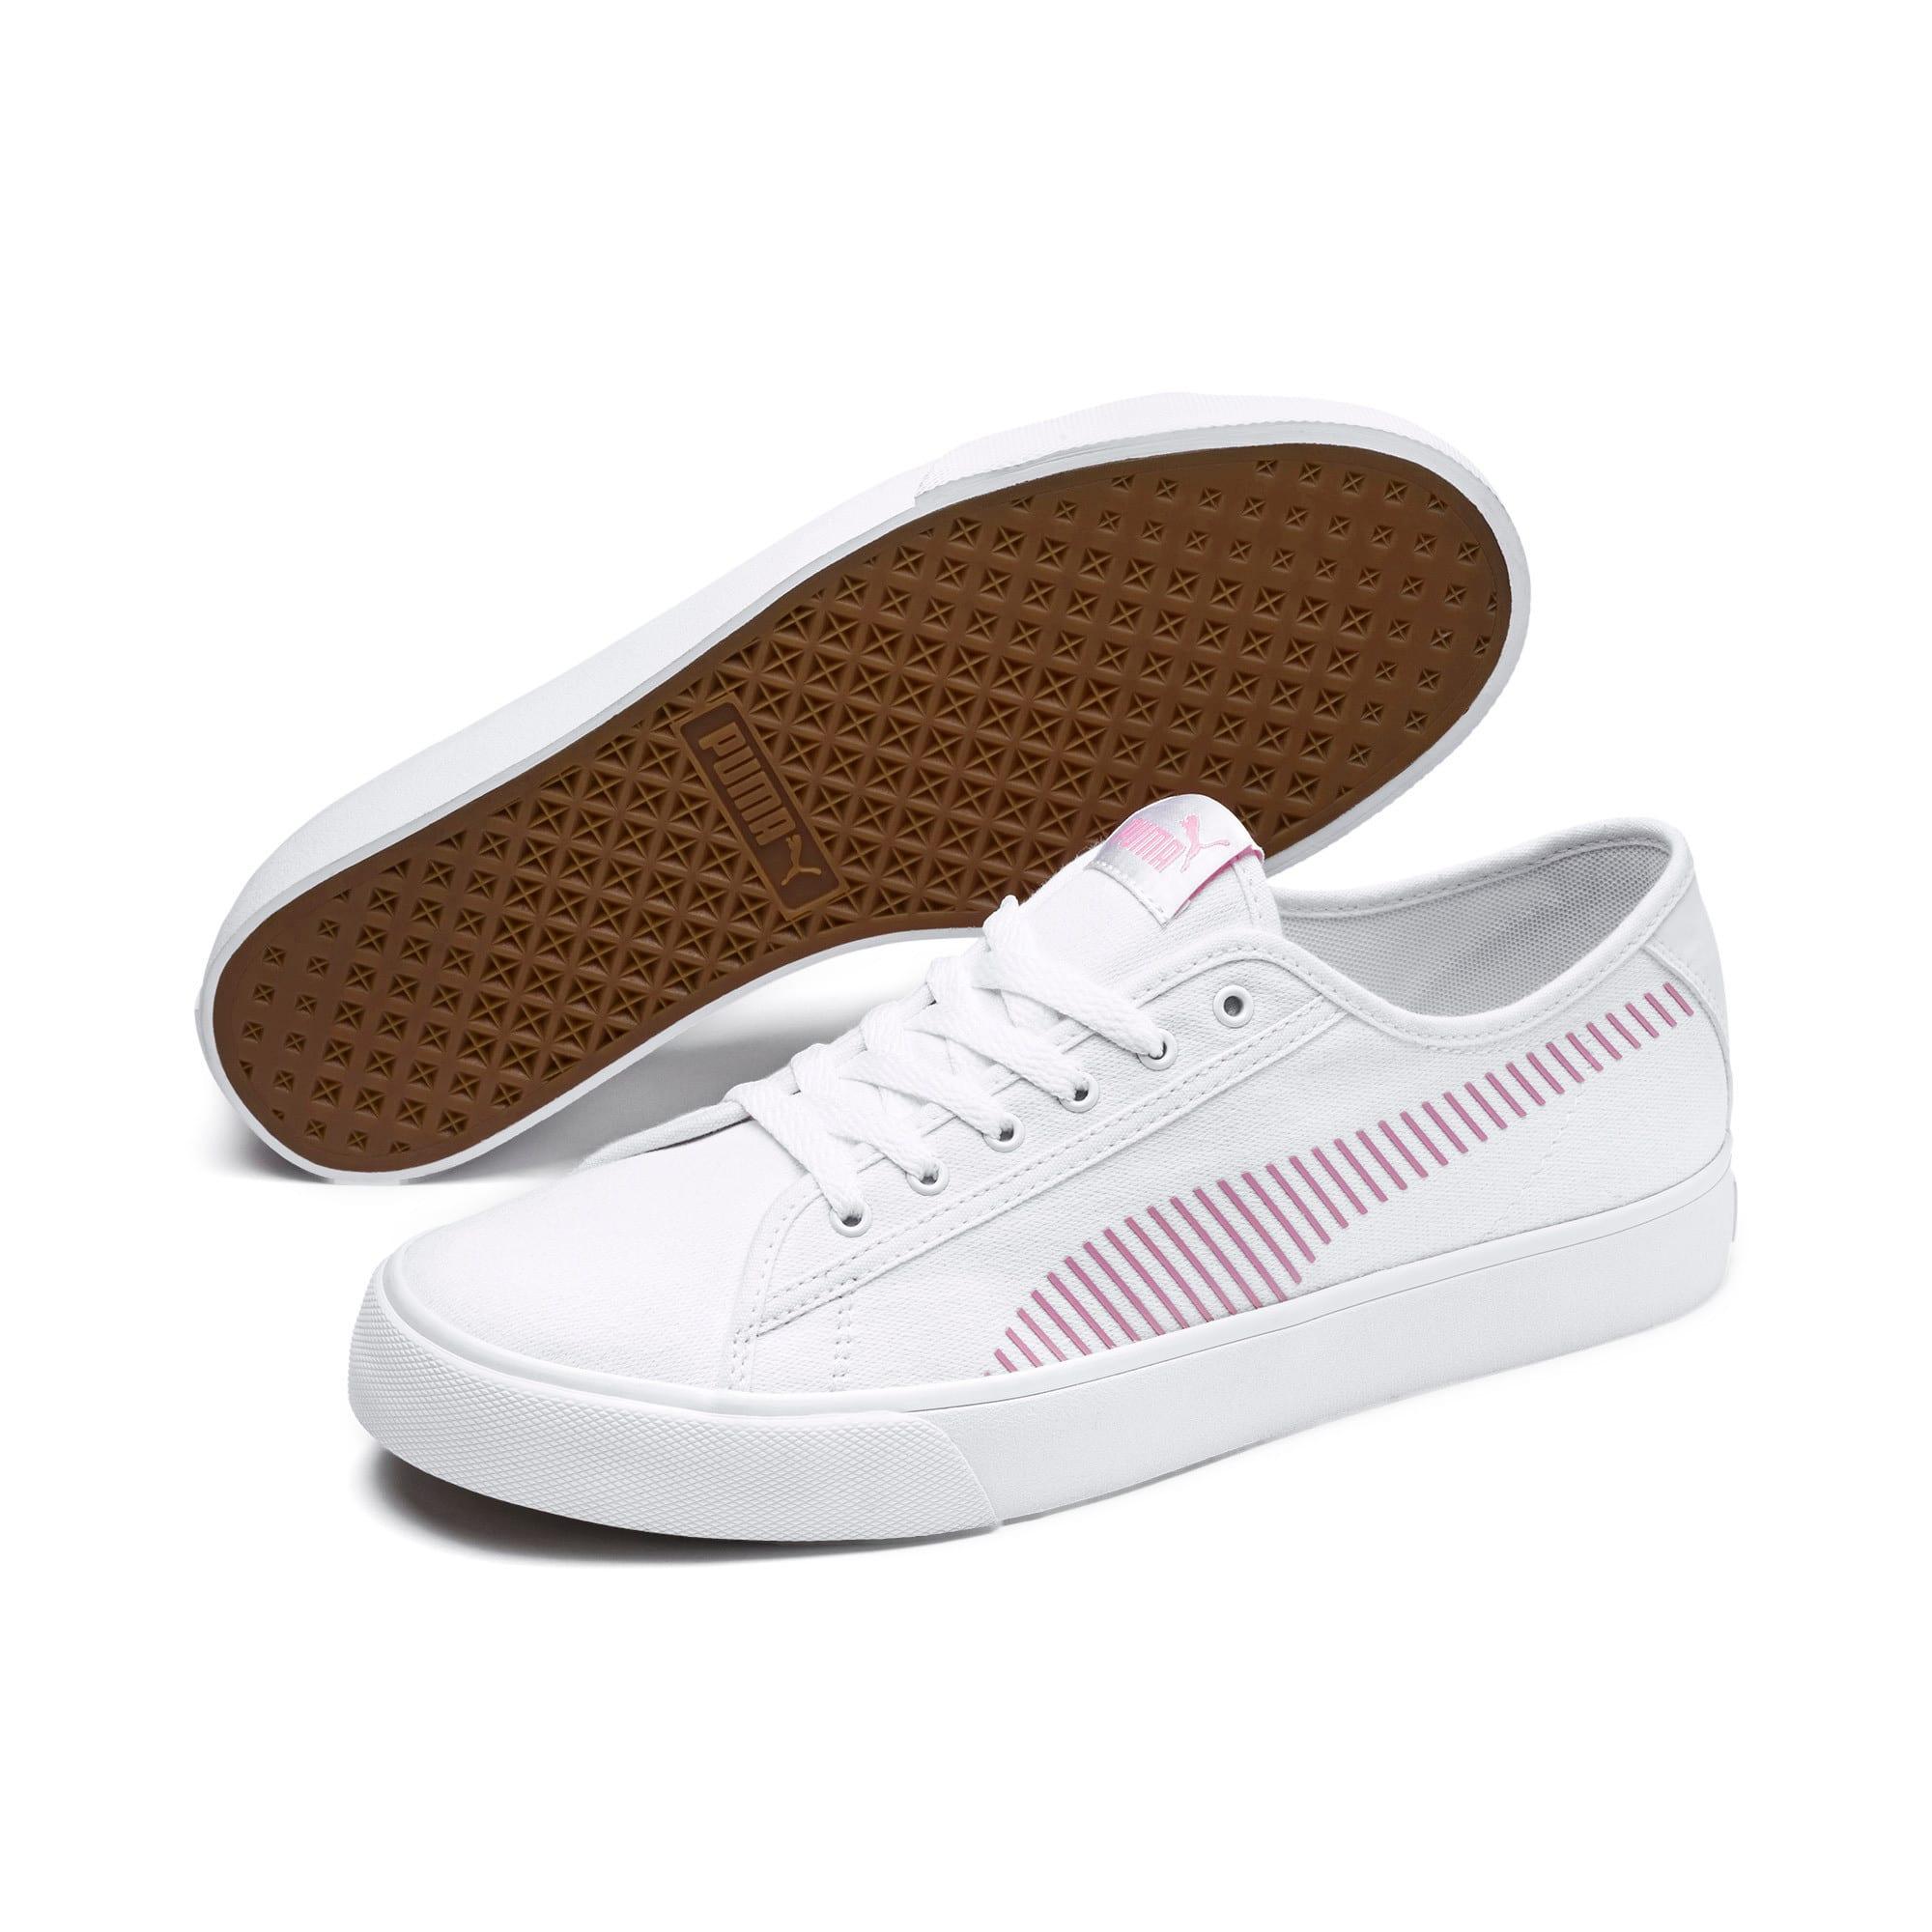 Thumbnail 2 of Bari Sneakers, Puma White-Pale Pink, medium